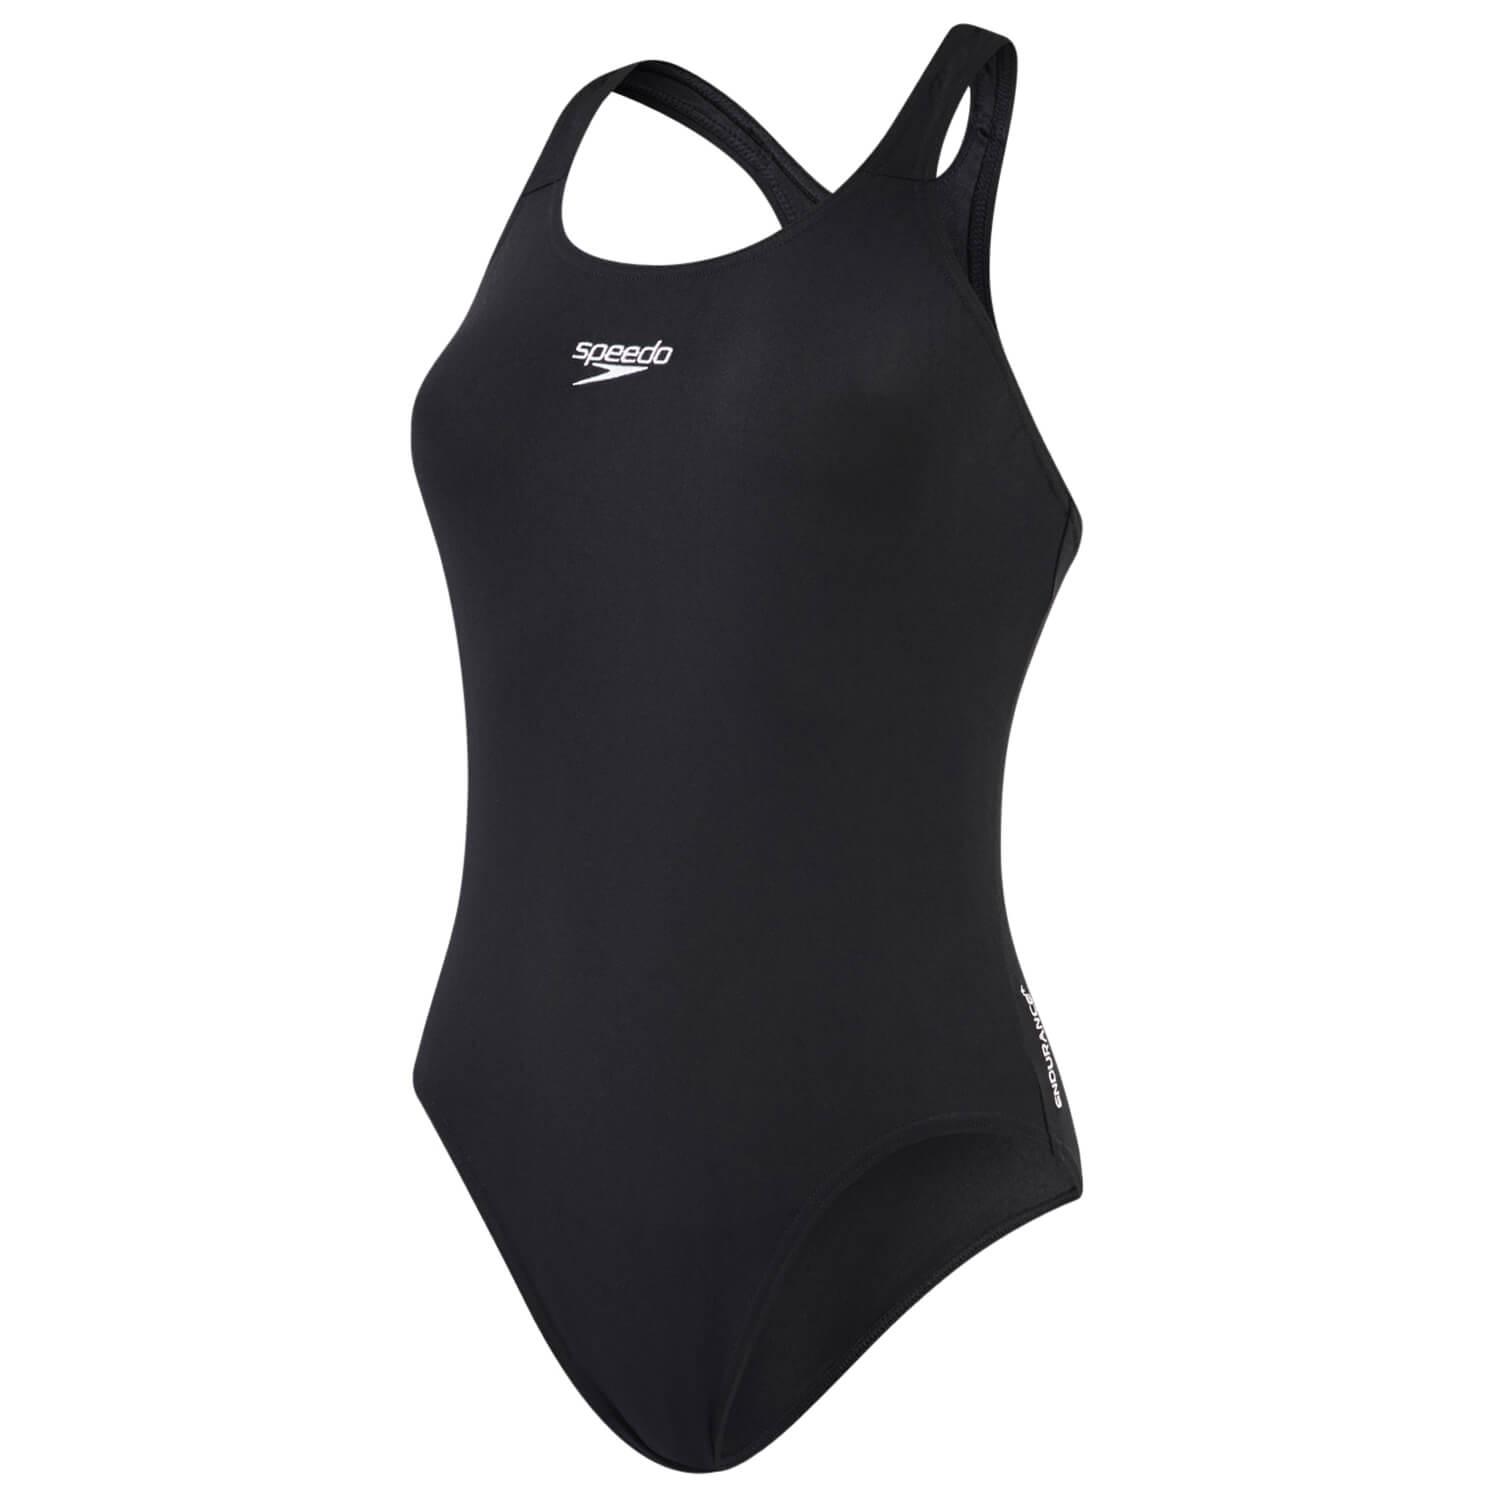 Speedo Women's Essential Endurance+ Medalist Swimsuit Navy | 34 (EU)